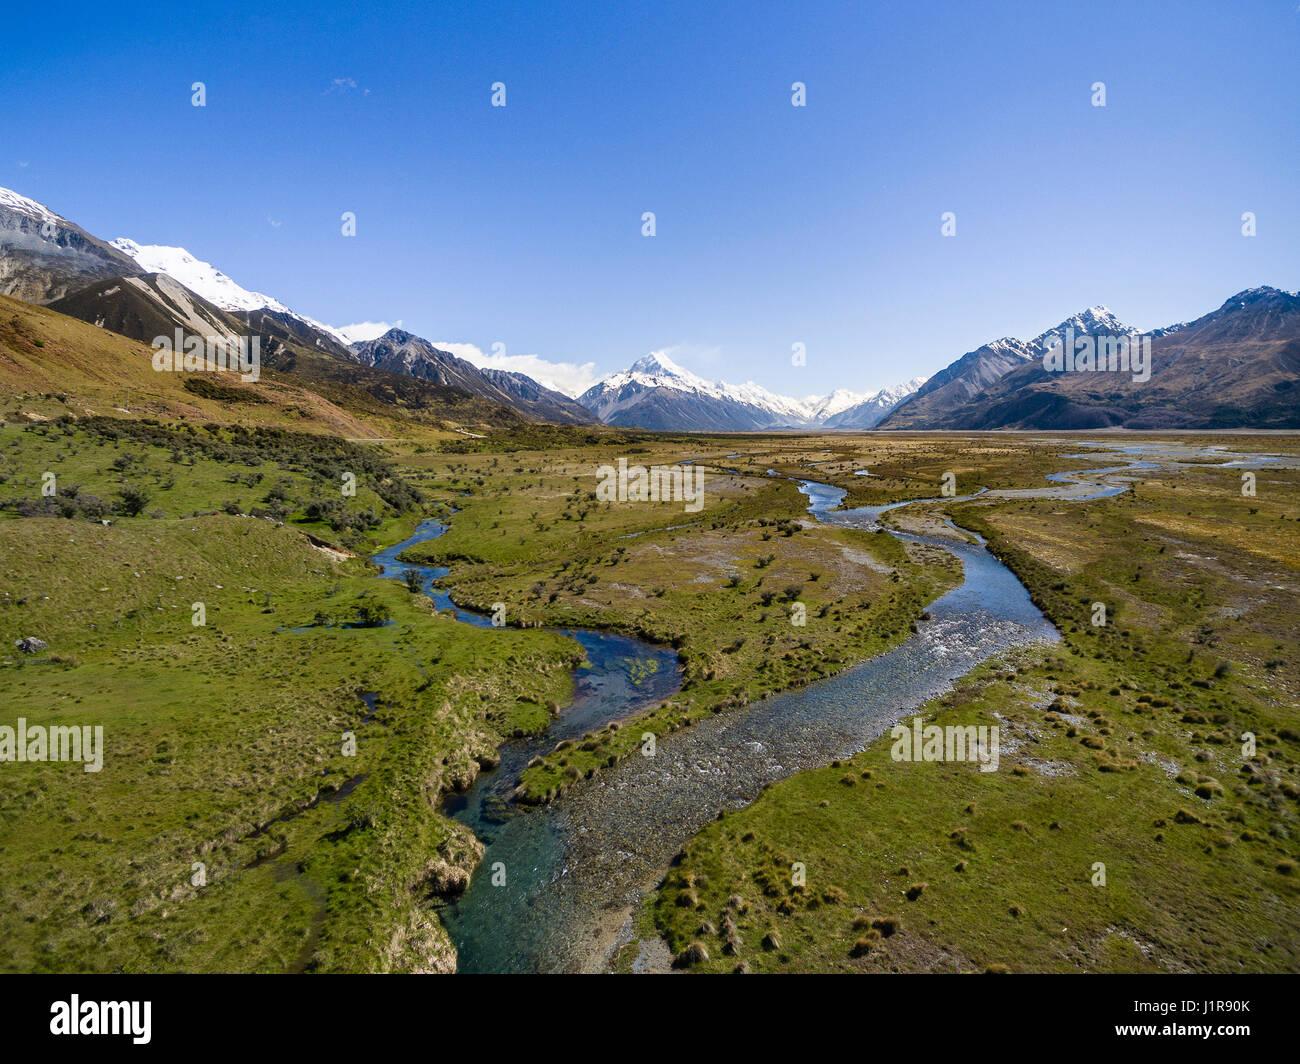 Breiten Flussbett des Tasman River, hinten Mount Cook, Mount Cook Nationalpark, Canterbury Region Southland, Neuseeland Stockbild